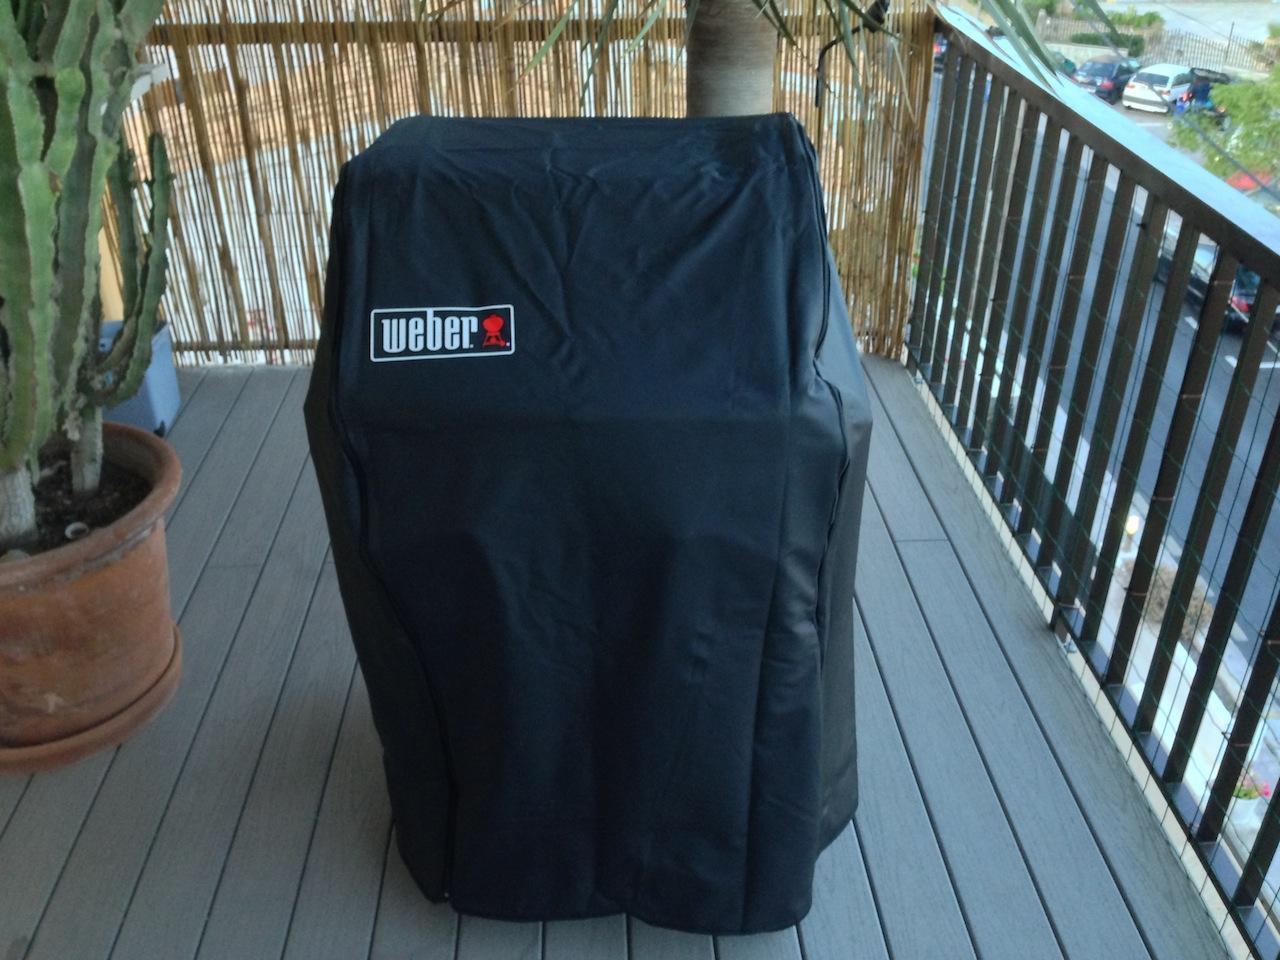 mein neuer gas grill weber spirit e 210 orirginal. Black Bedroom Furniture Sets. Home Design Ideas